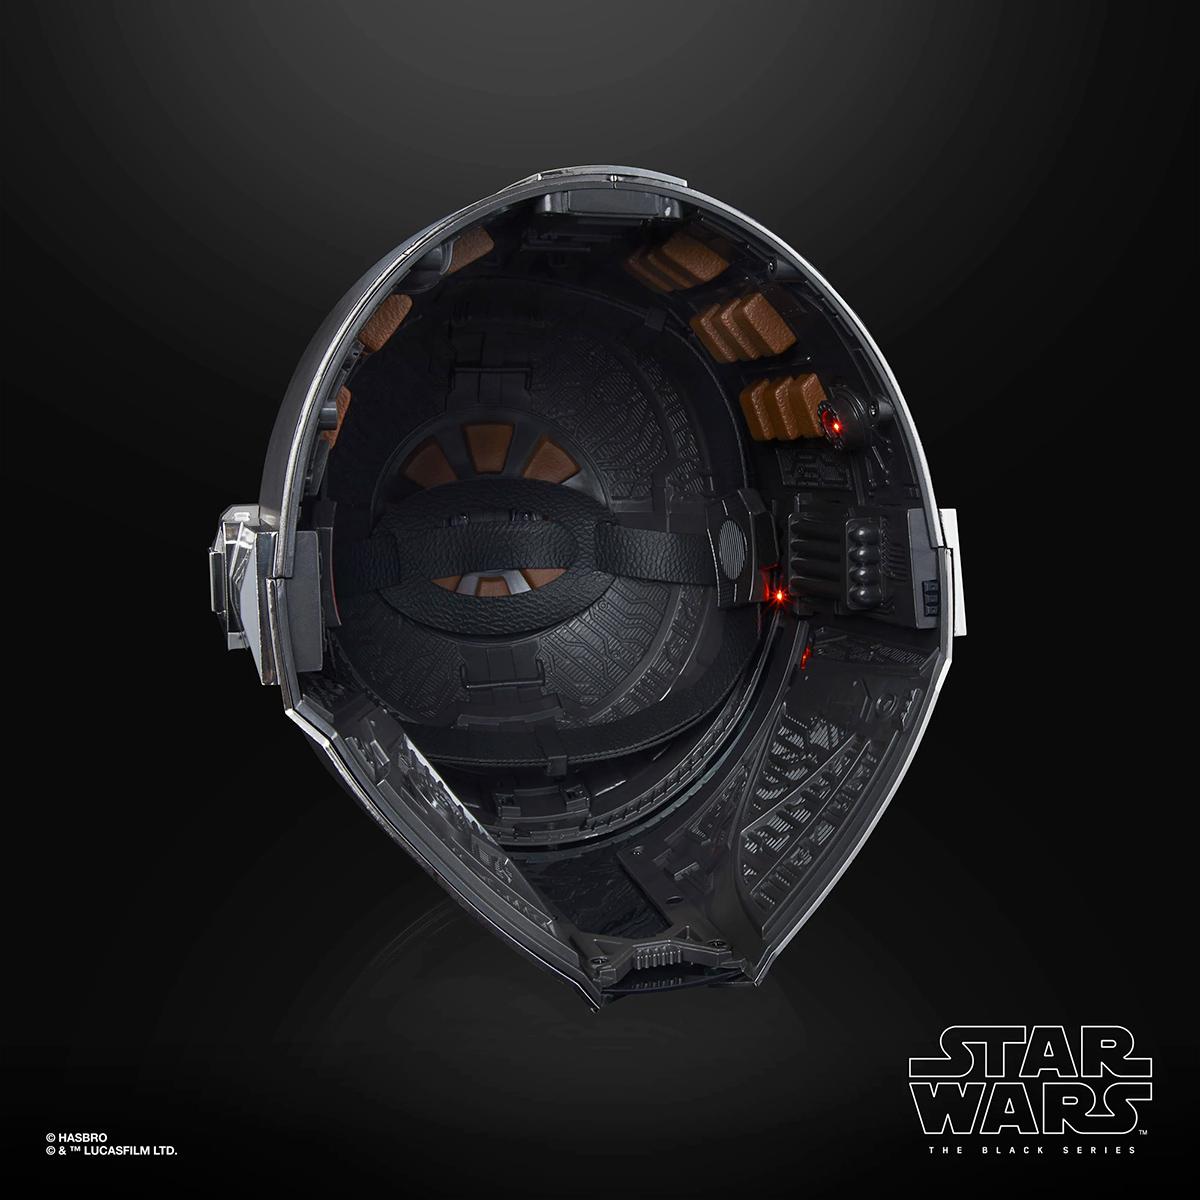 Capacete Eletrônico The Mandalorian Electronic Helmet Star Wars The Black Series